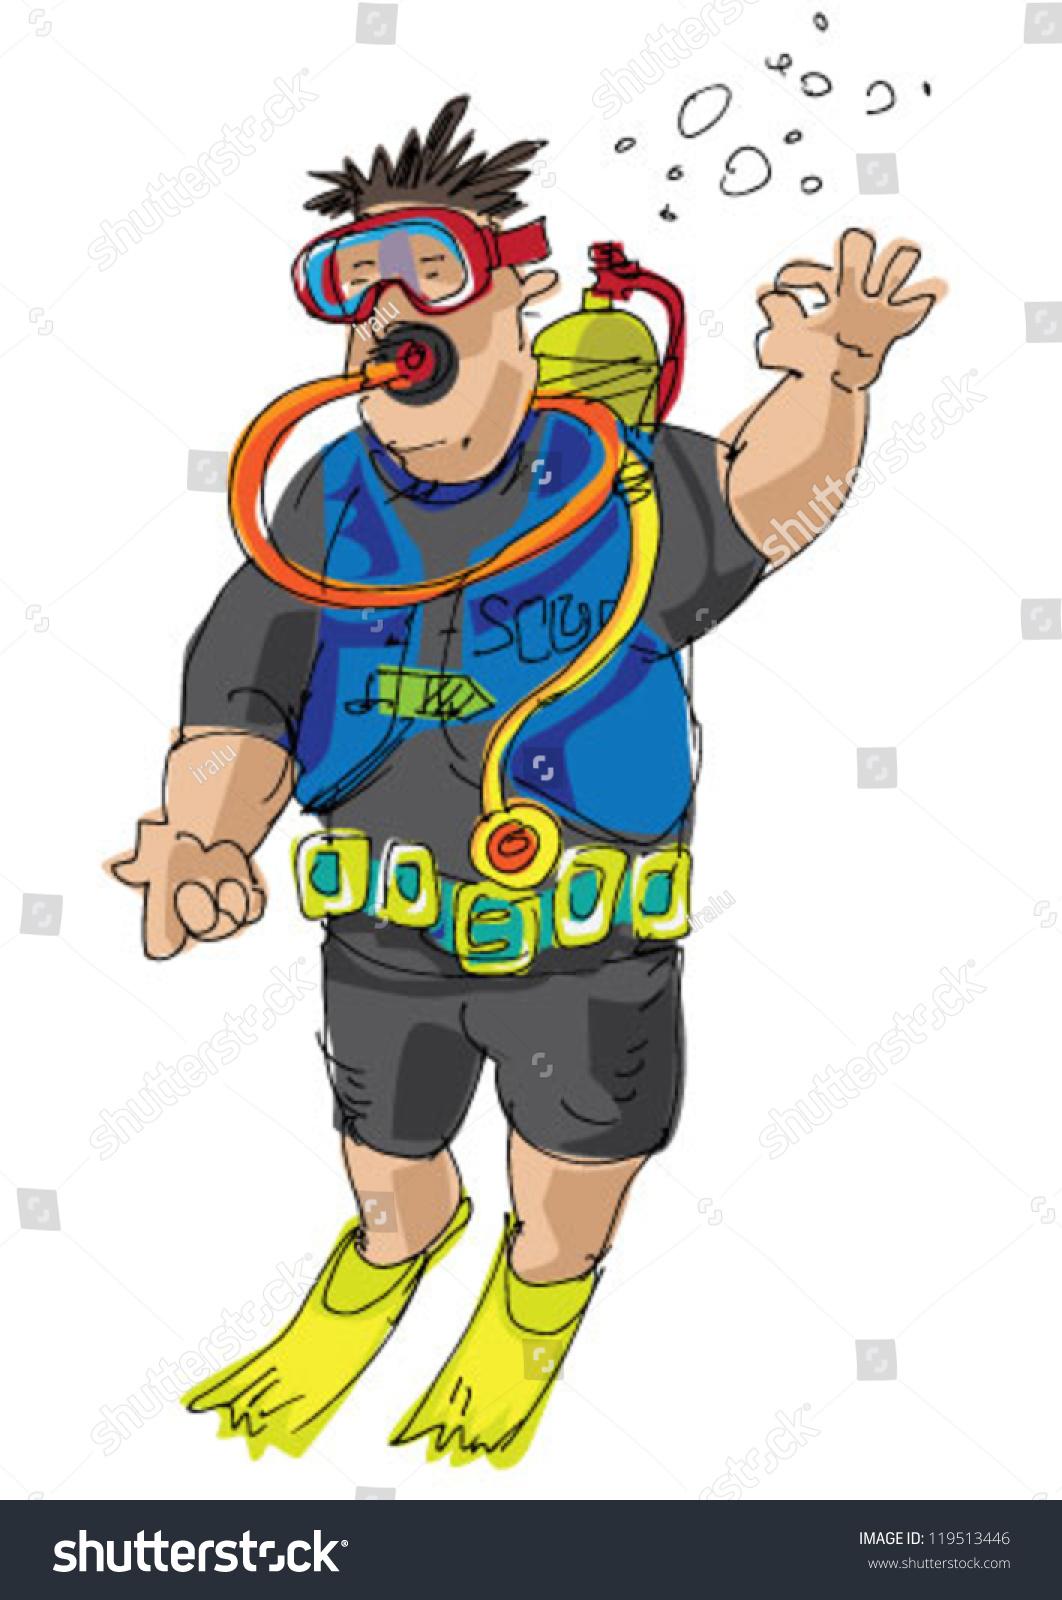 Scuba Diver Cartoon Stock Vector 119513446 - Shutterstock